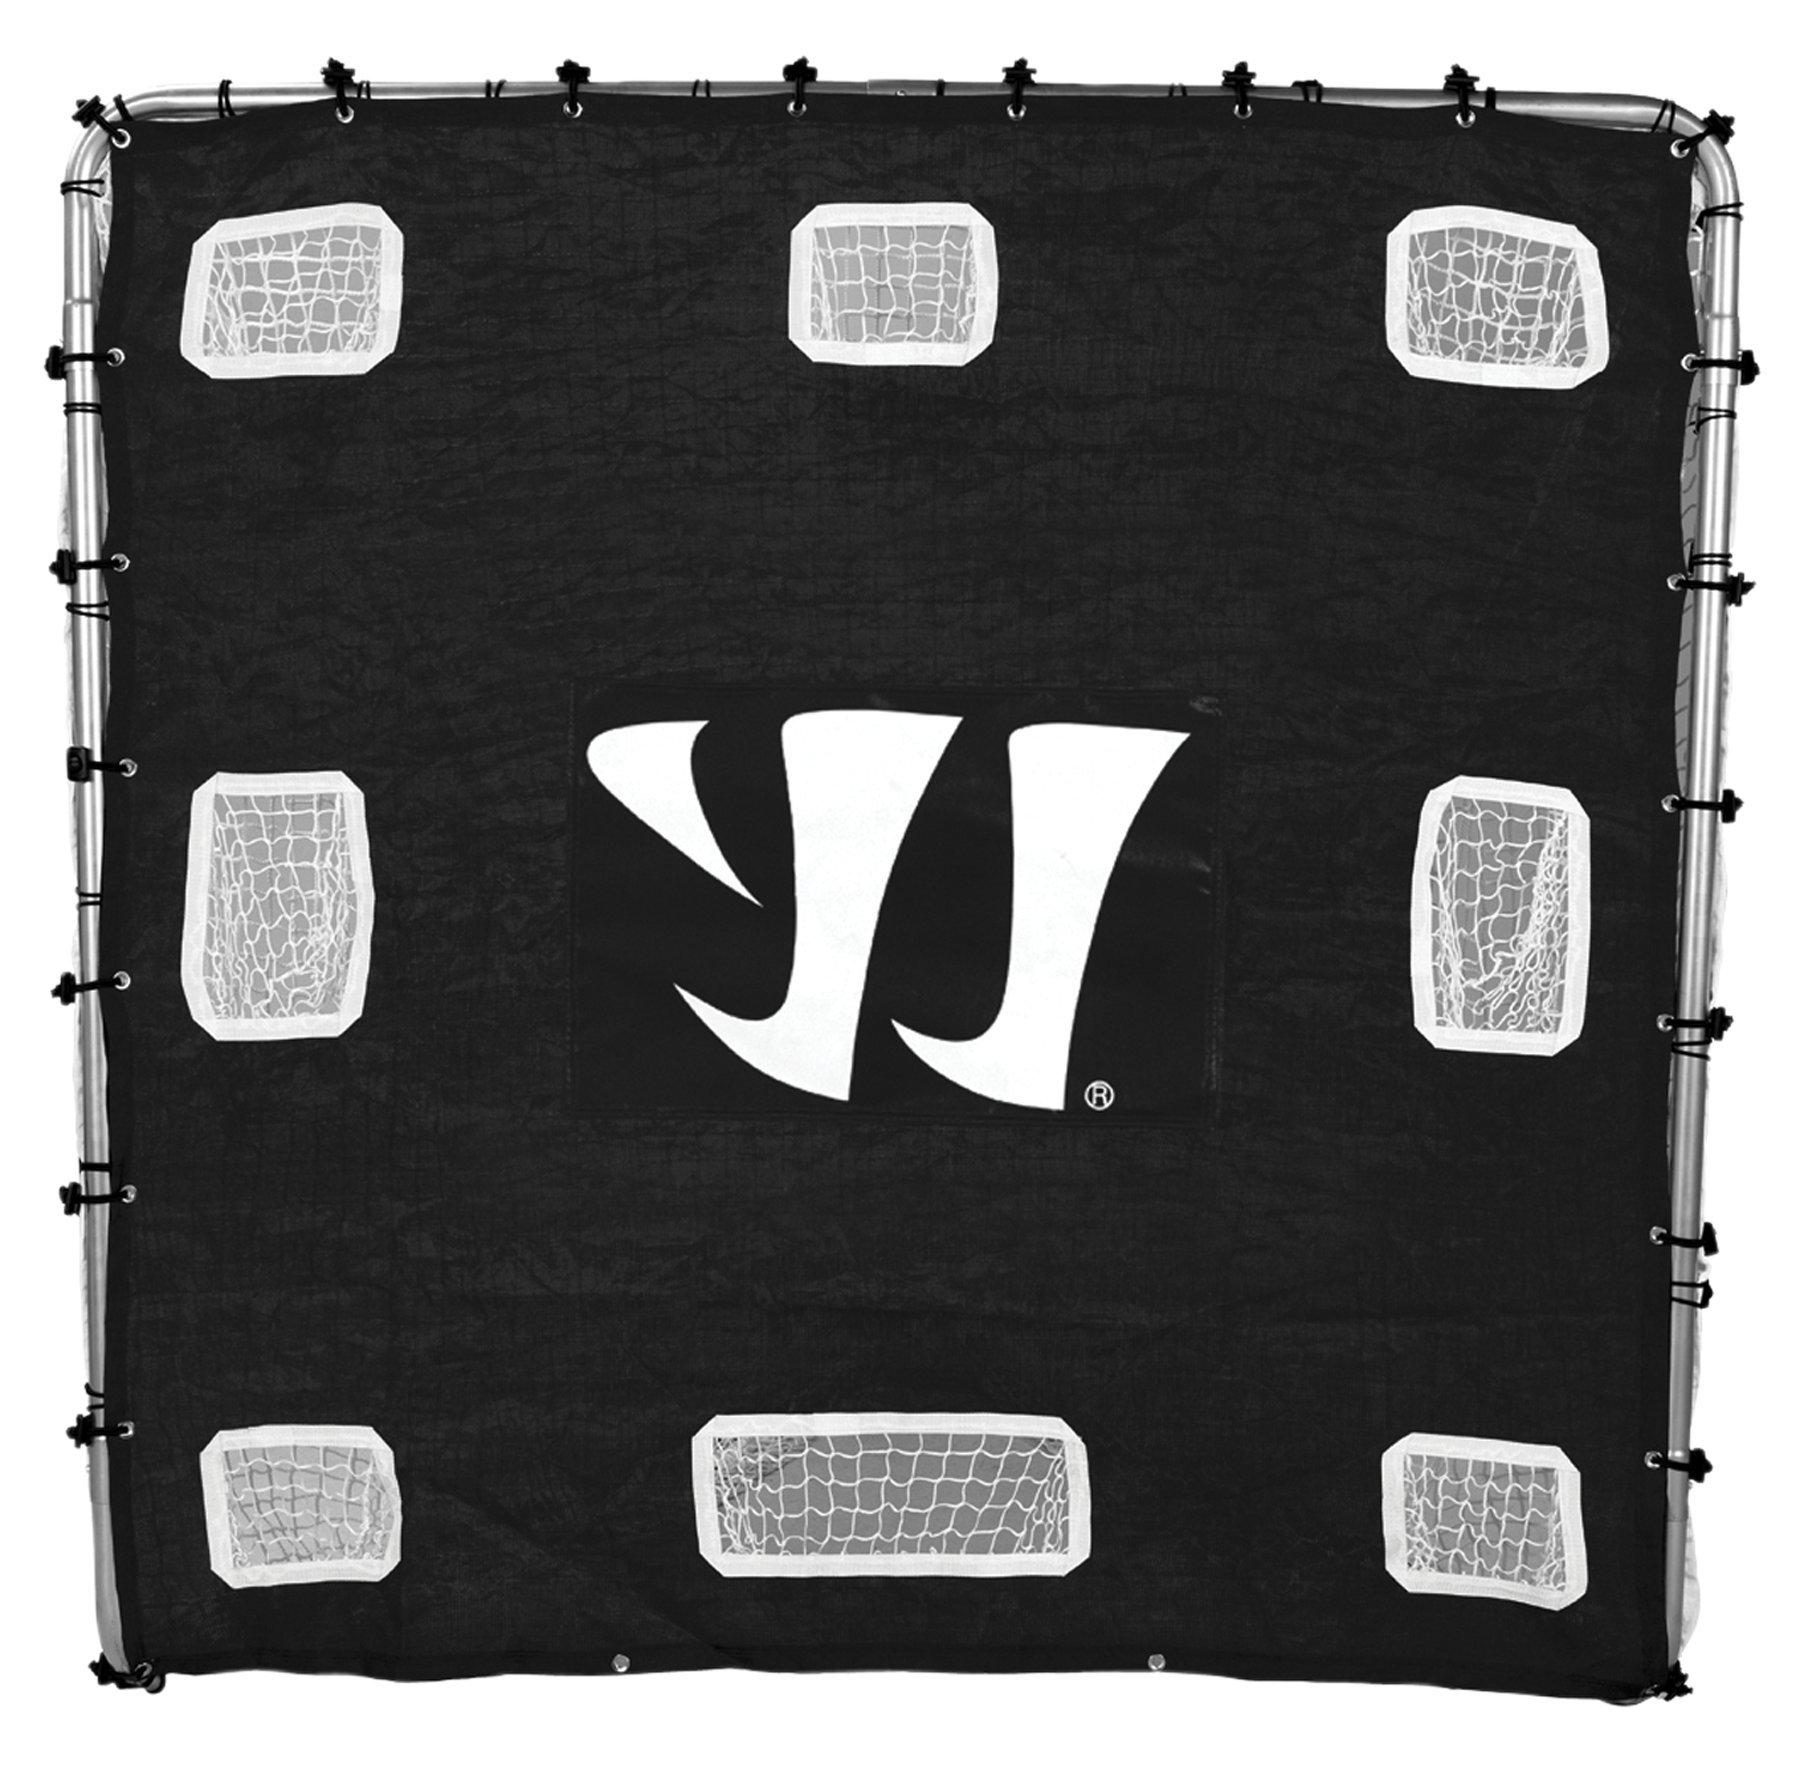 Warrior Full Goal Target- Fits 6X6 Goals